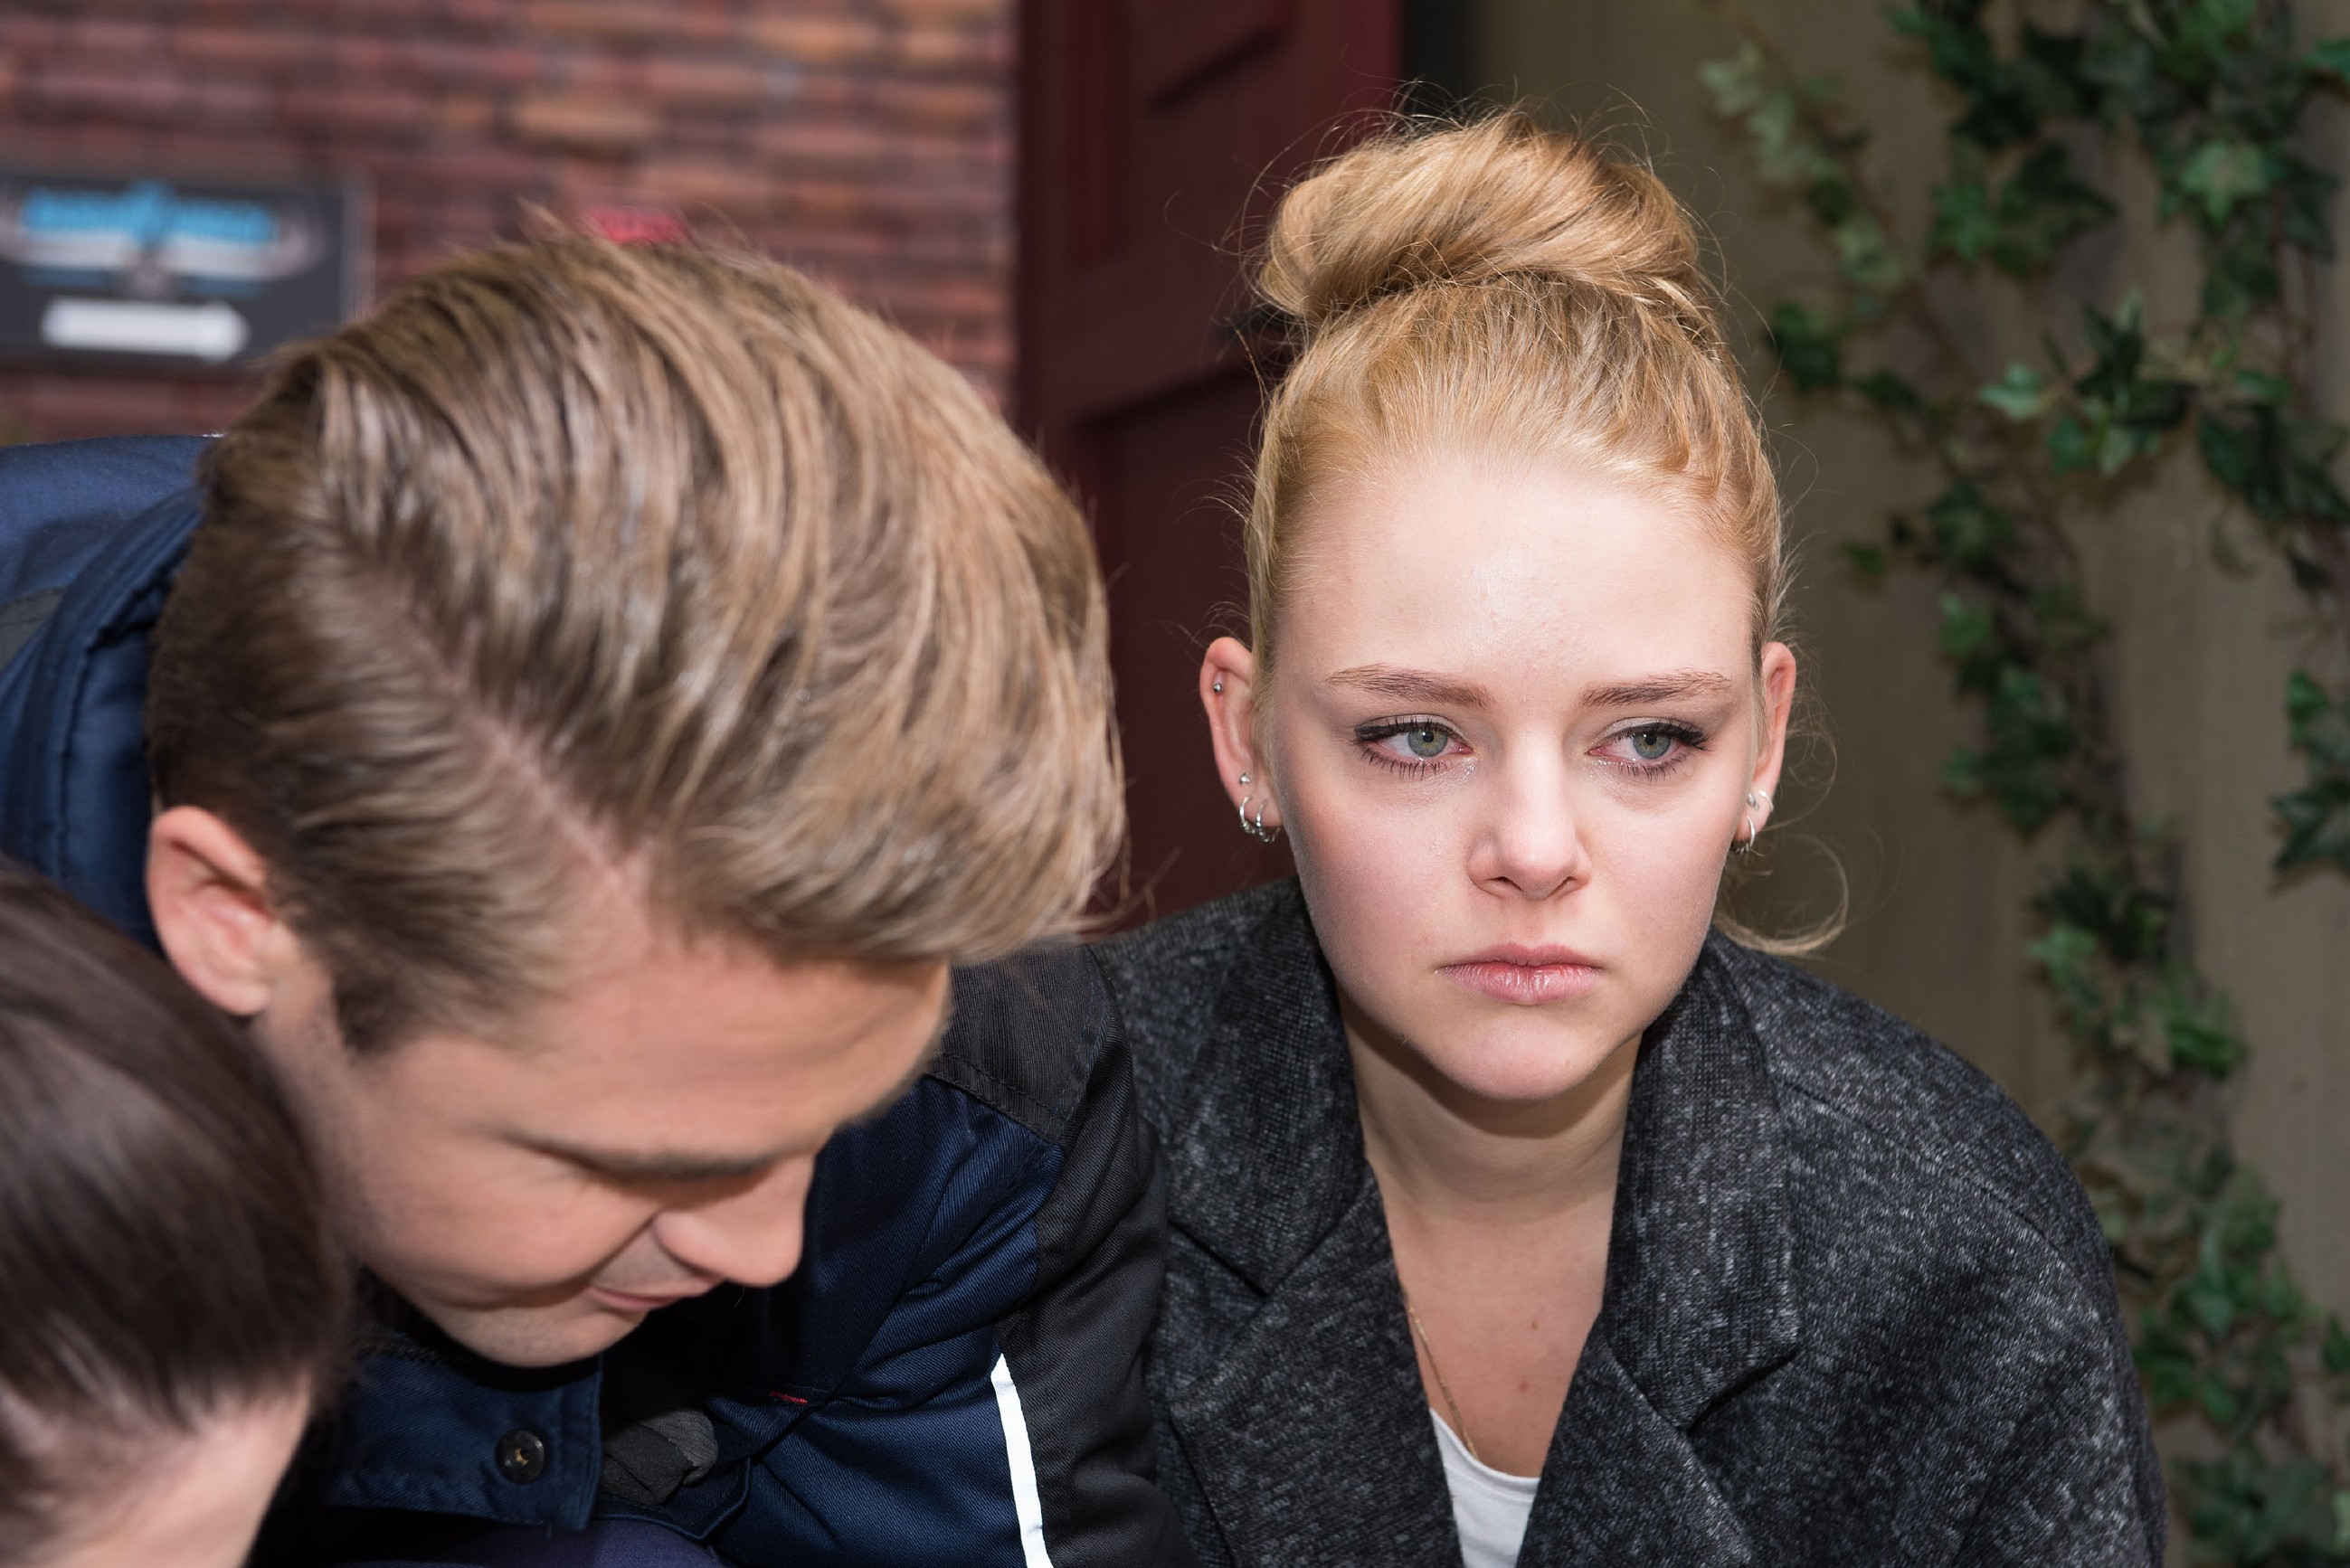 Während Bambi (Benjamin Heinrich) sich um Rolf kümmert, ist Fiona (Olivia Burkhart) geschockt, Rolf so hilflos zu sehen. (Quelle: RTL / Stefan Behrens)